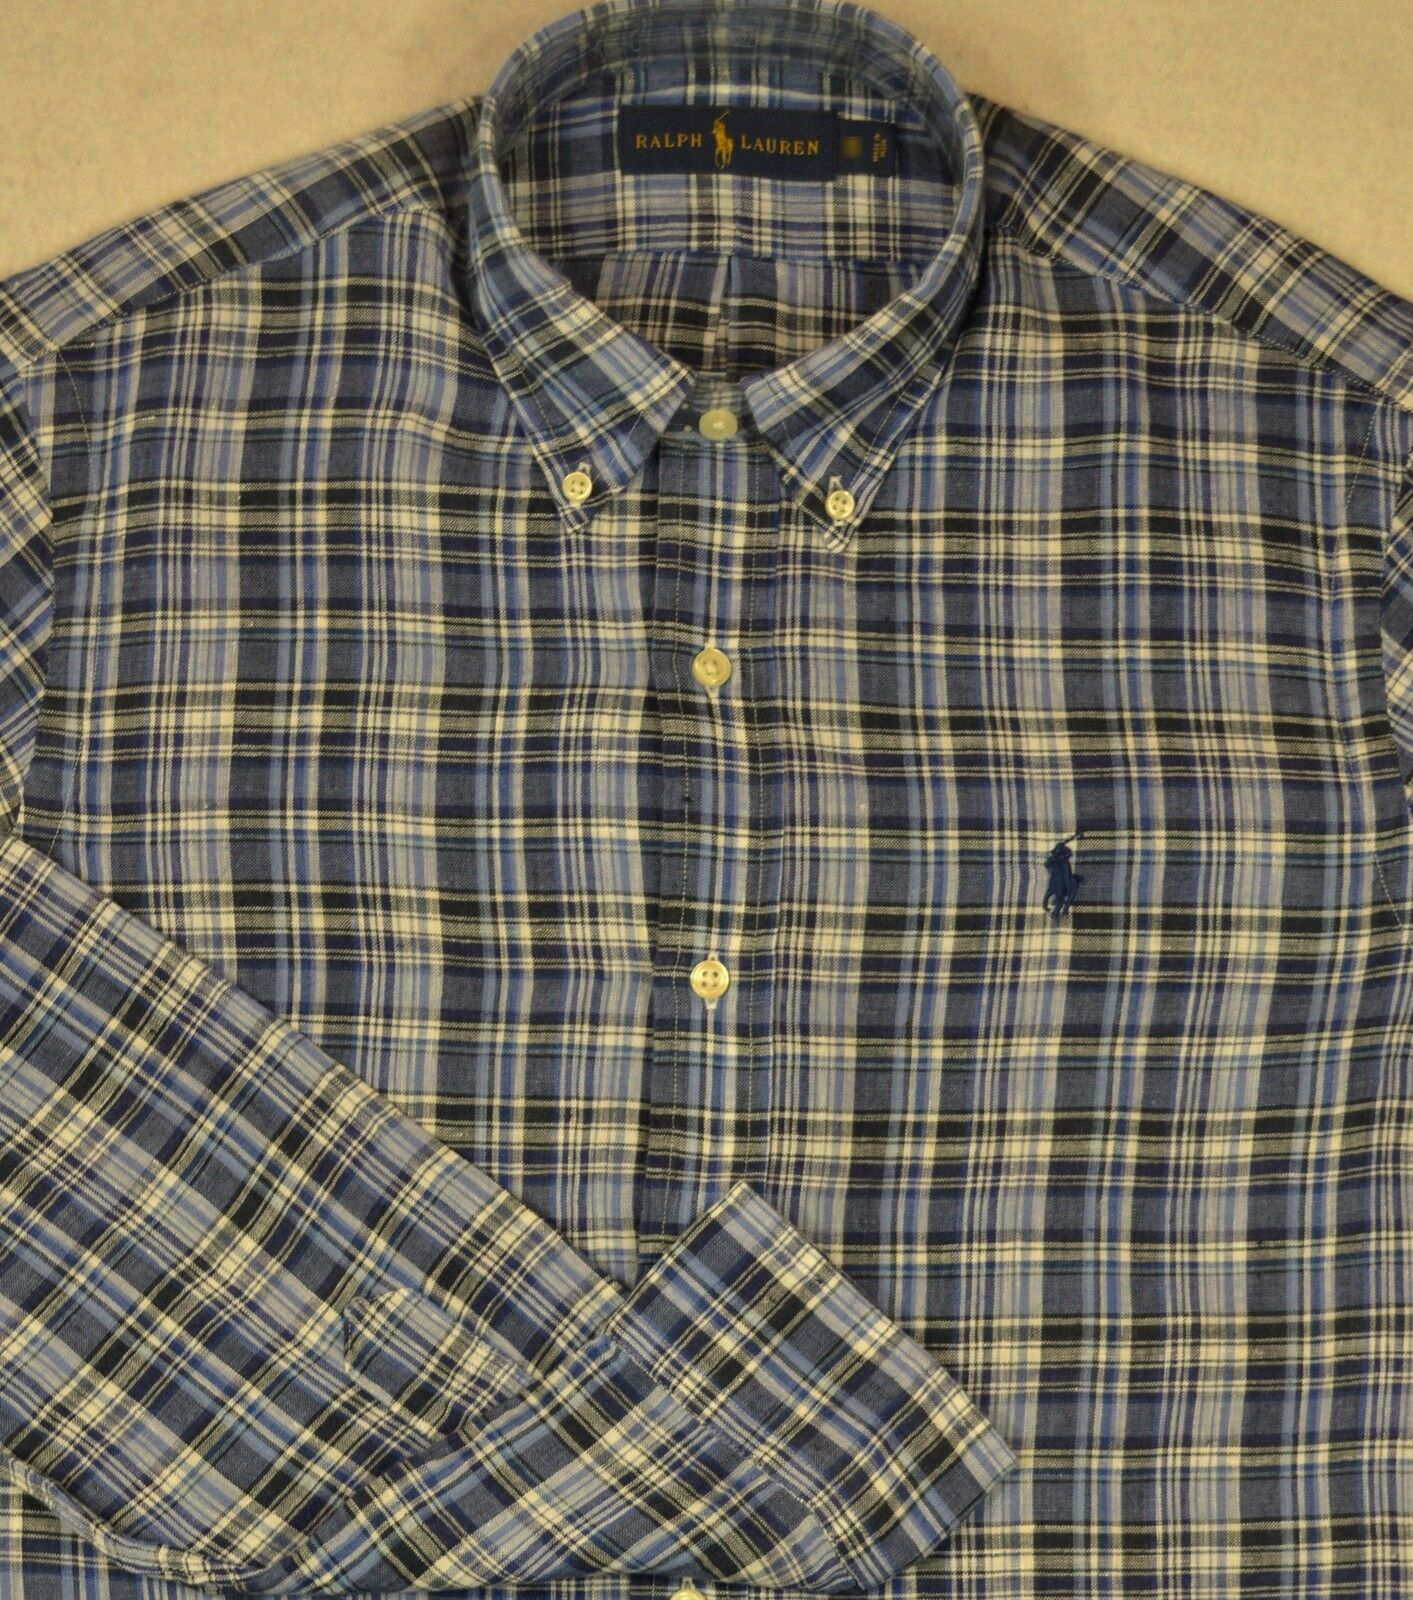 Polo Ralph Lauren Linen Shirt Long Sleeves Button-Front Size S SMALL NWT